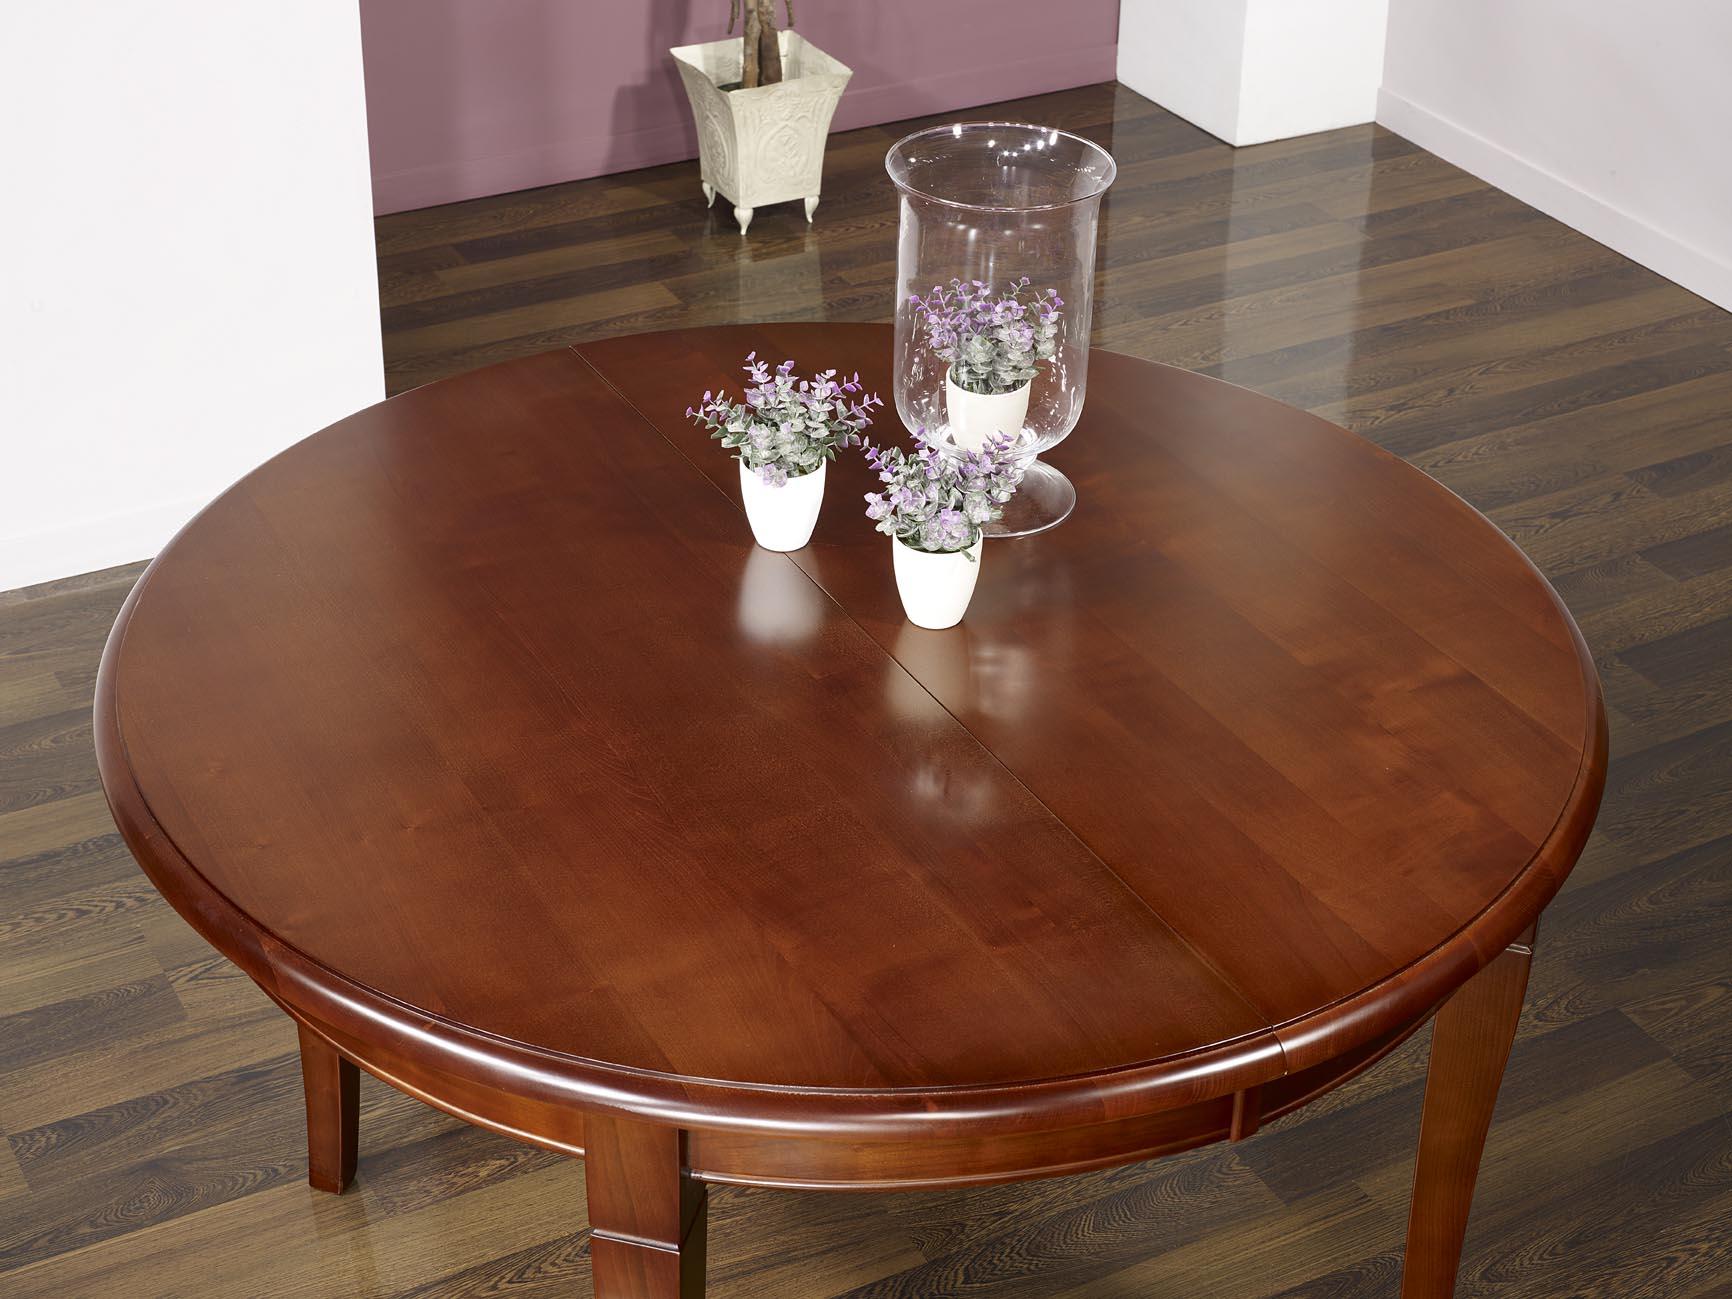 Table ronde camille 4 pieds sabres en merisier massif de - Diametre table ronde 4 personnes ...